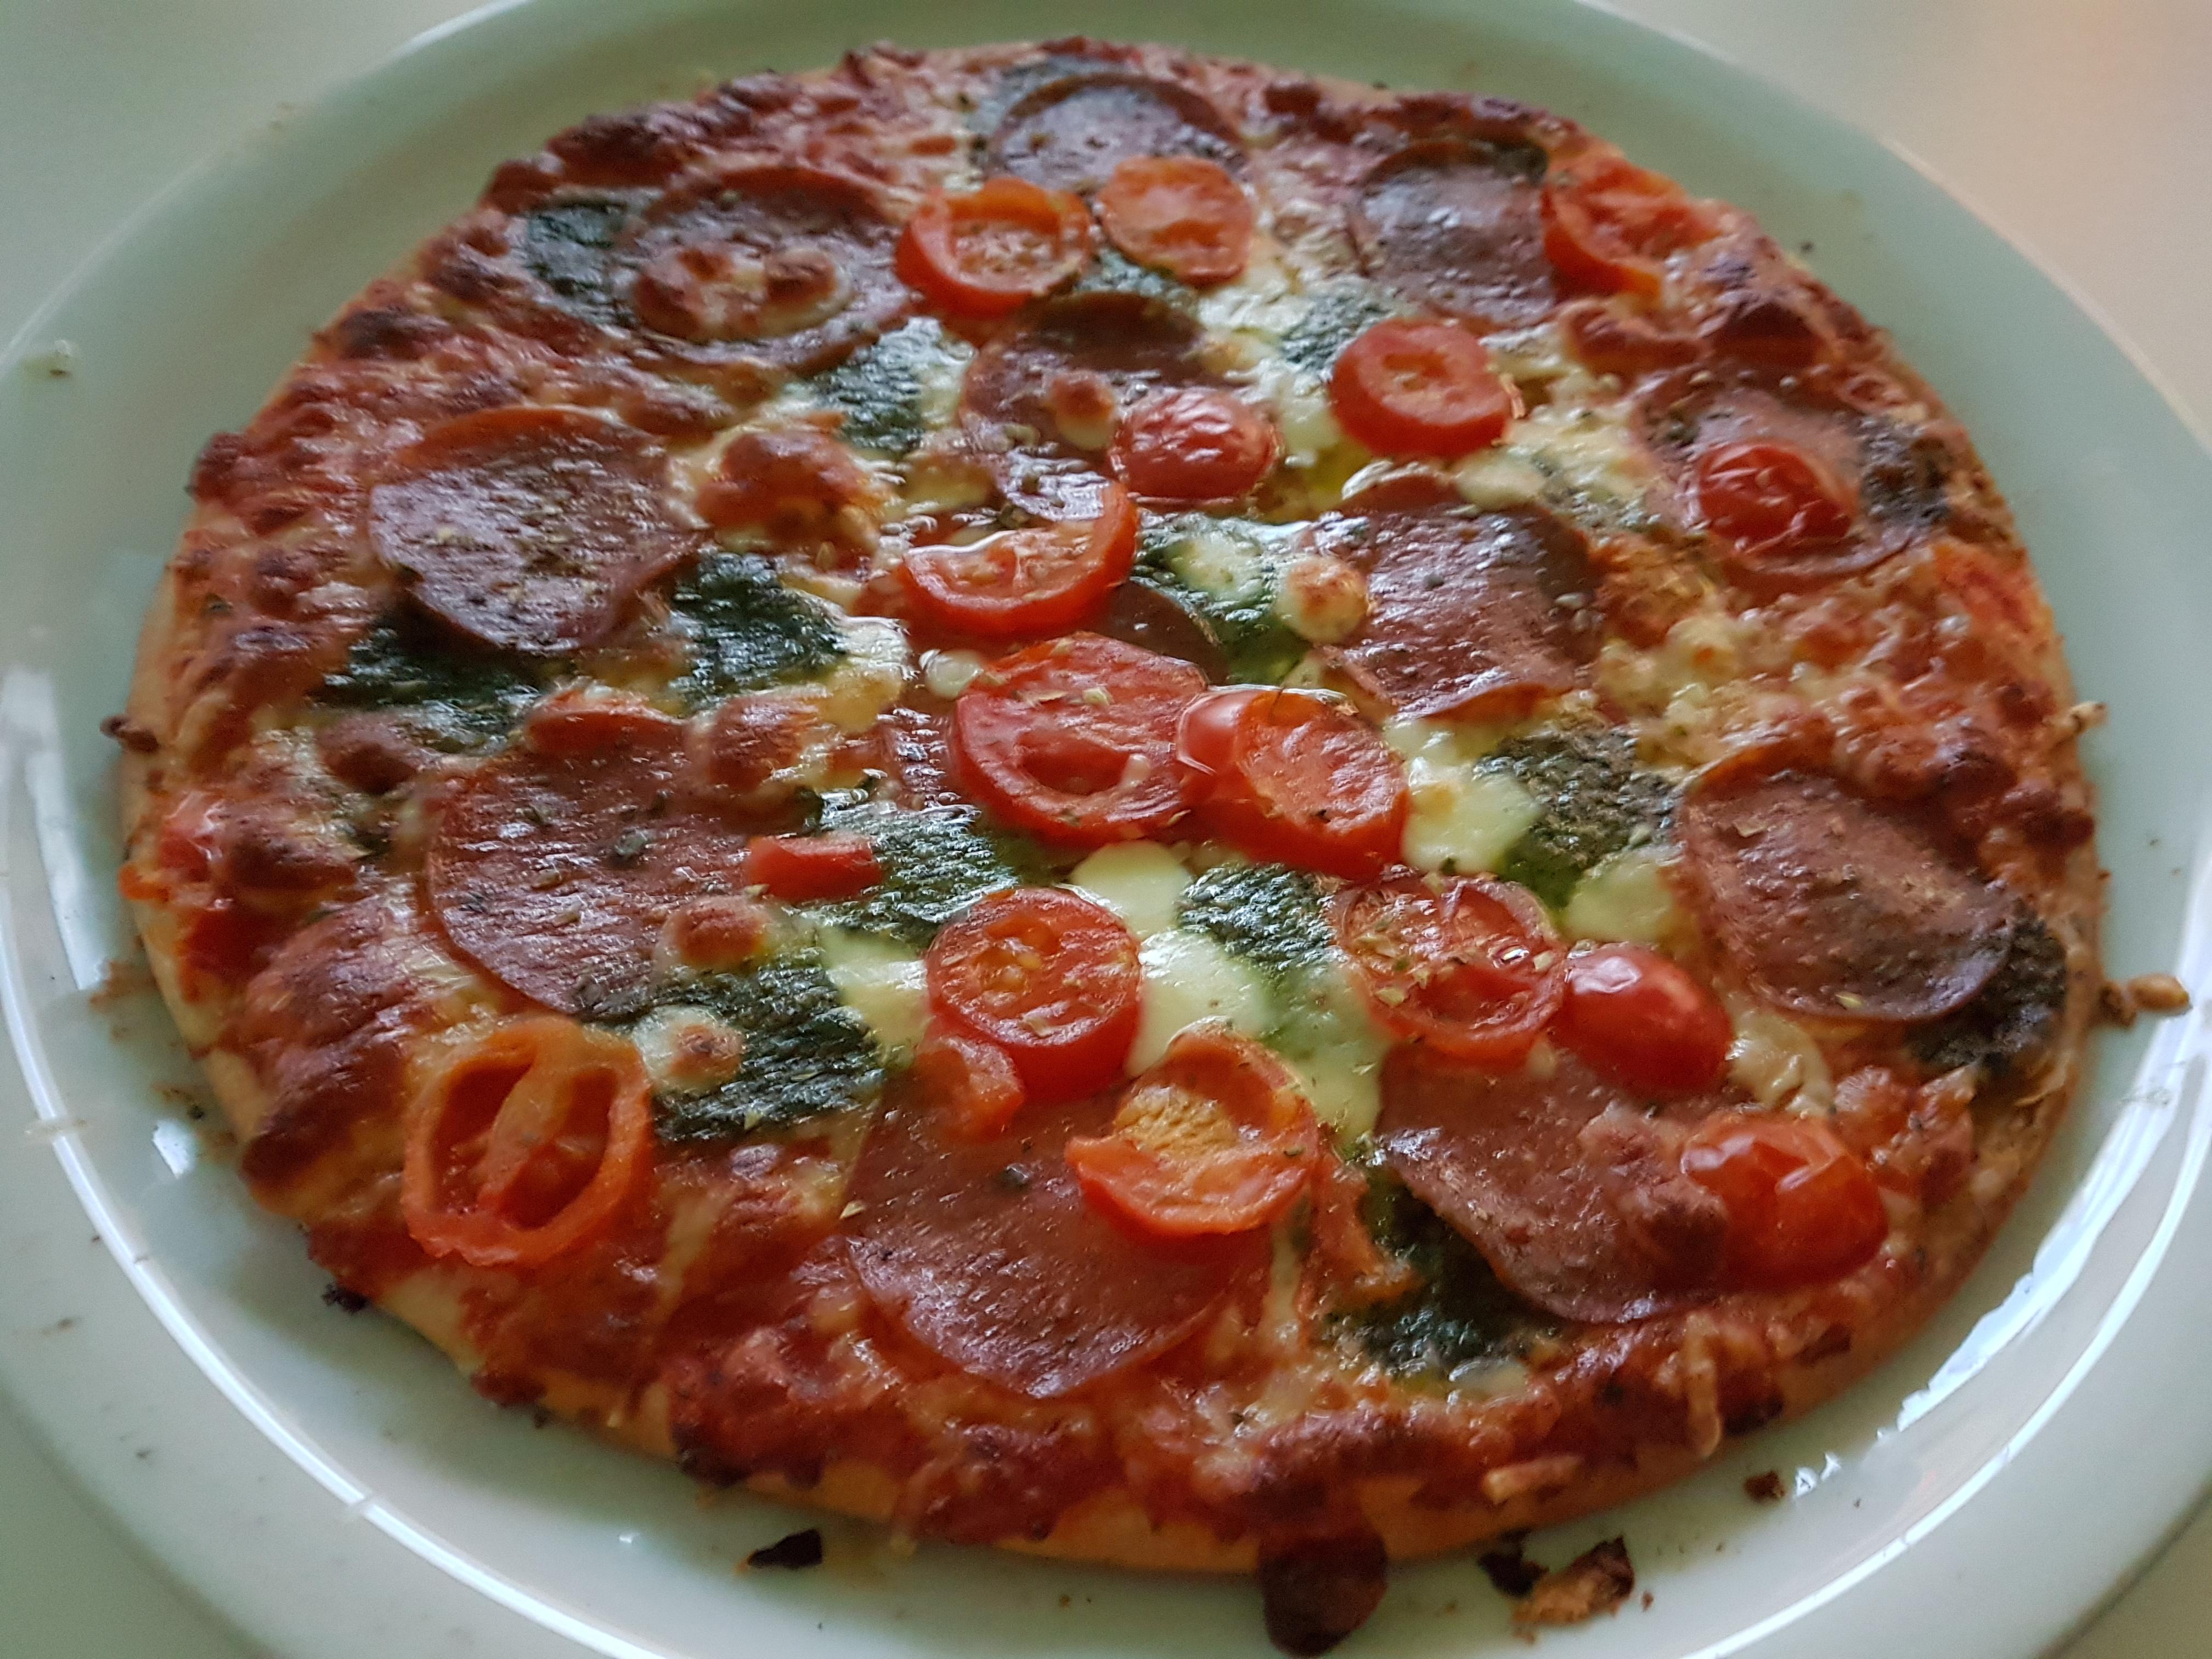 http://foodloader.net/Holz_2017-06-25_Pizza_2.jpg